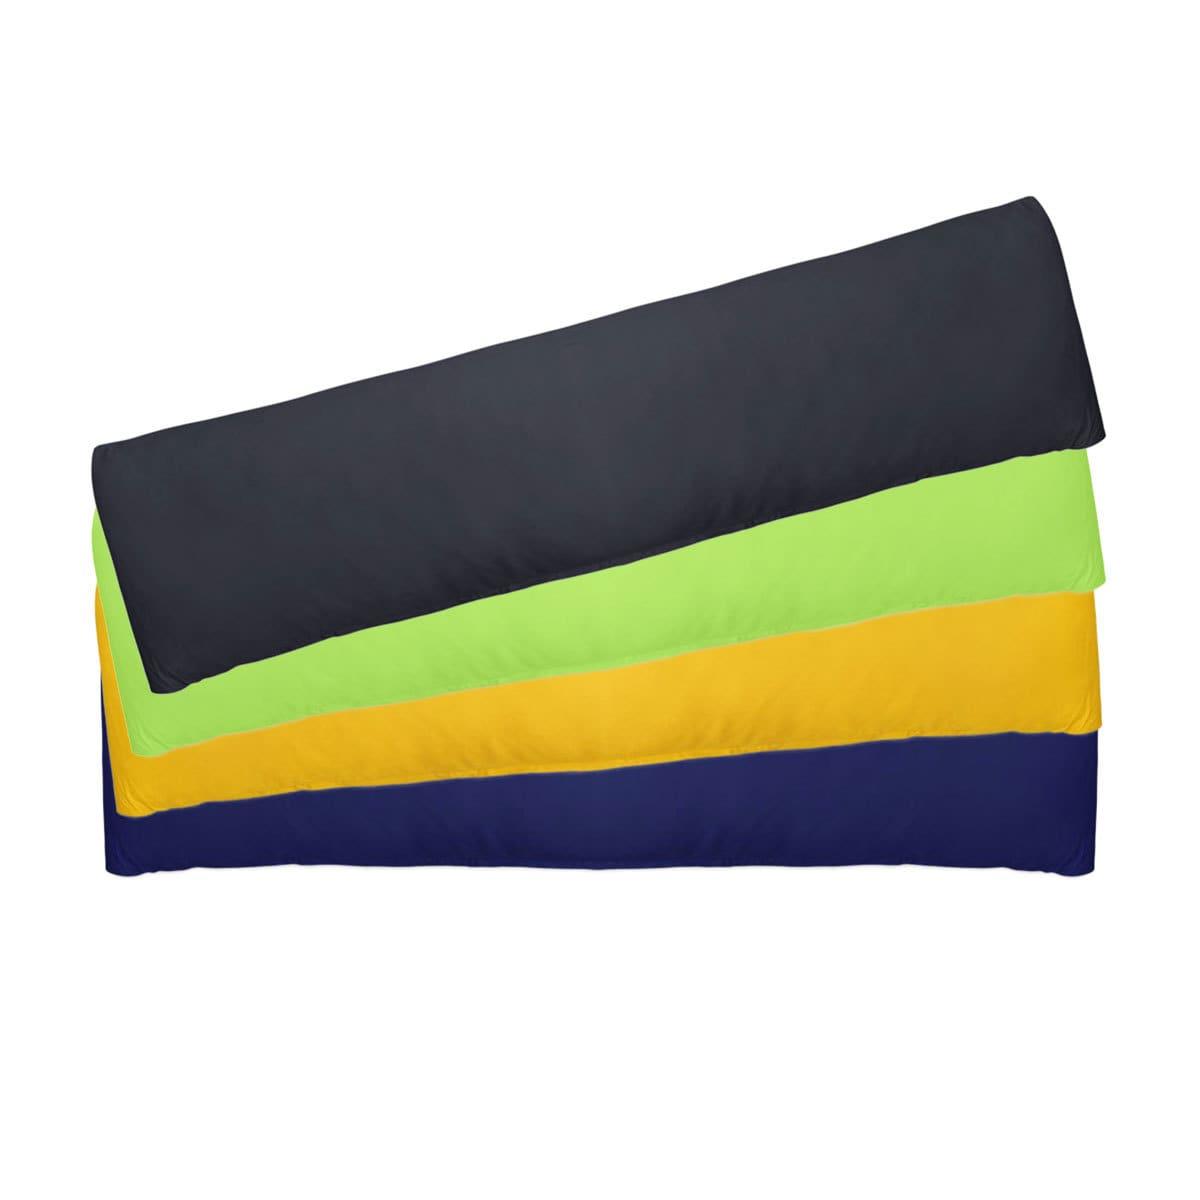 bettwarenshop bezug f r seitenschl ferkissen g nstig online kaufen bei bettwaren shop. Black Bedroom Furniture Sets. Home Design Ideas